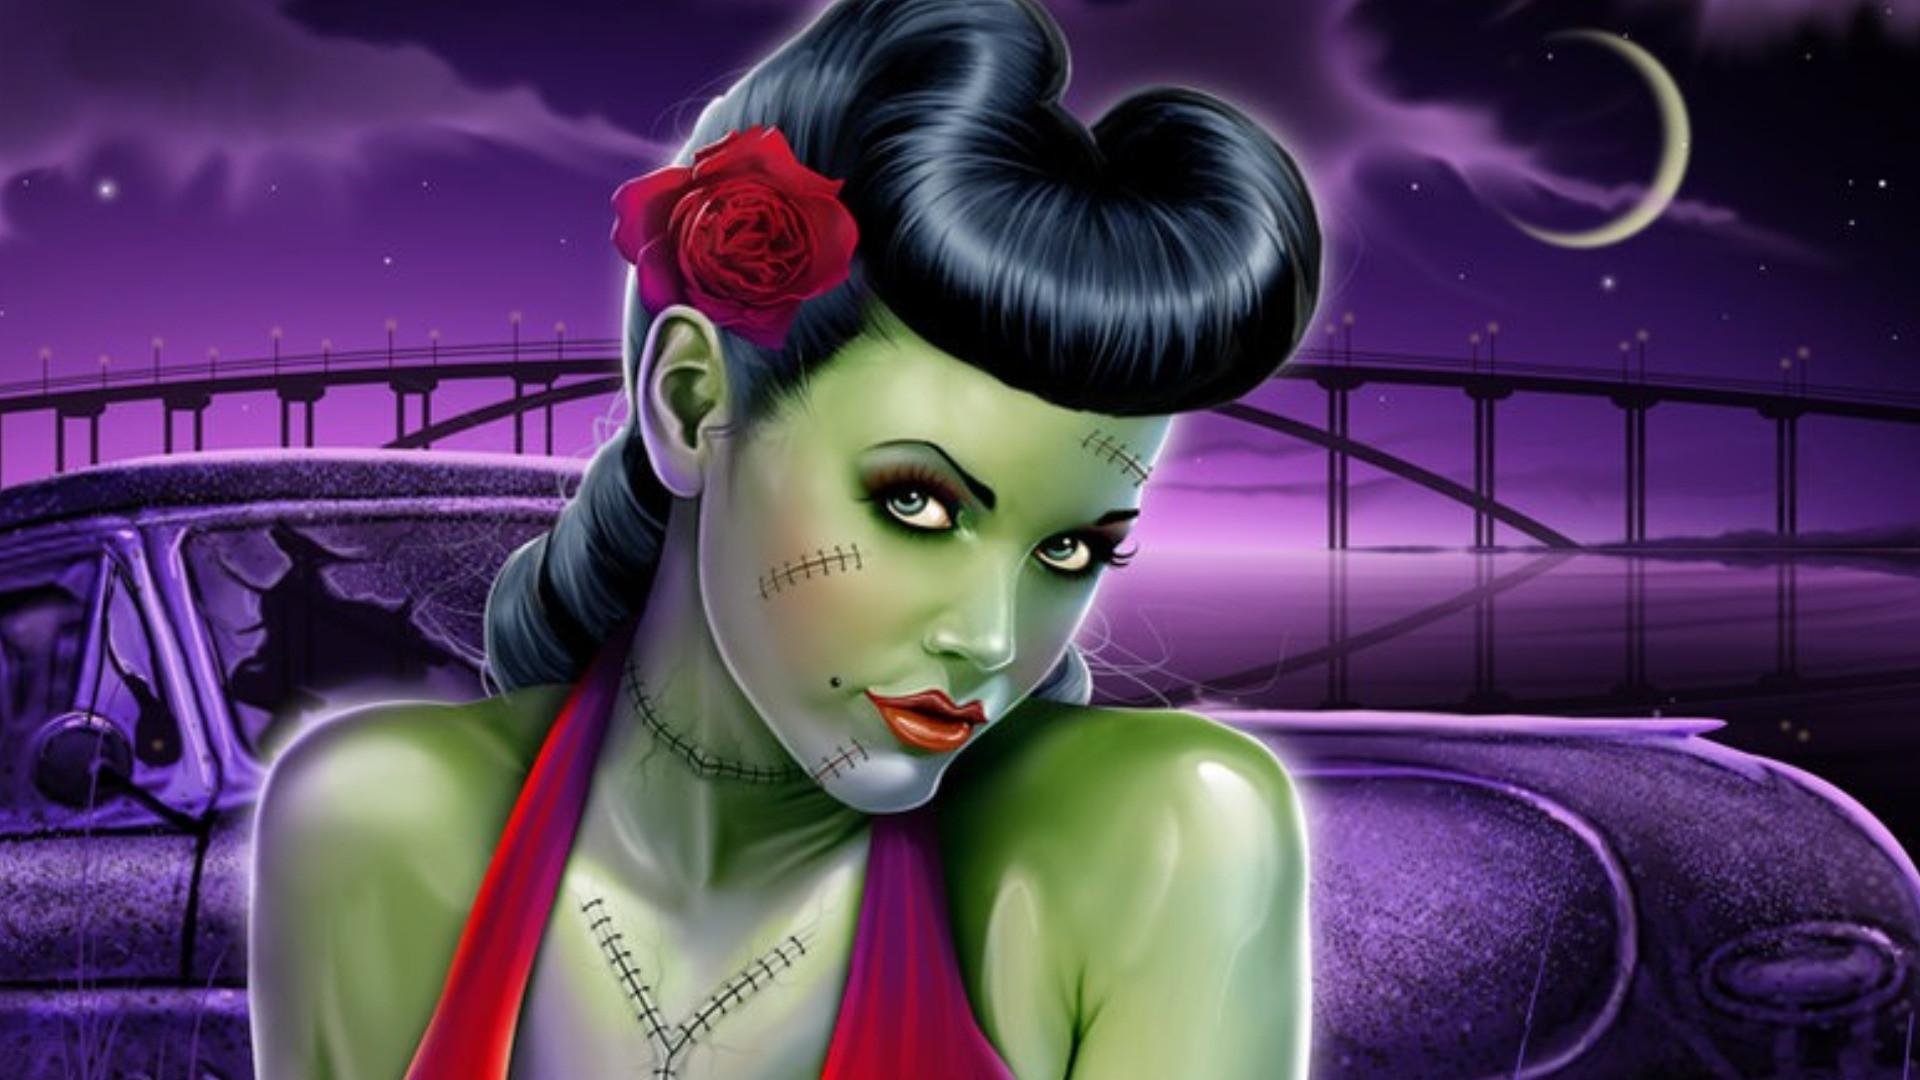 … Tattooed Pin Up Girl Wallpapers WallpaperSafari